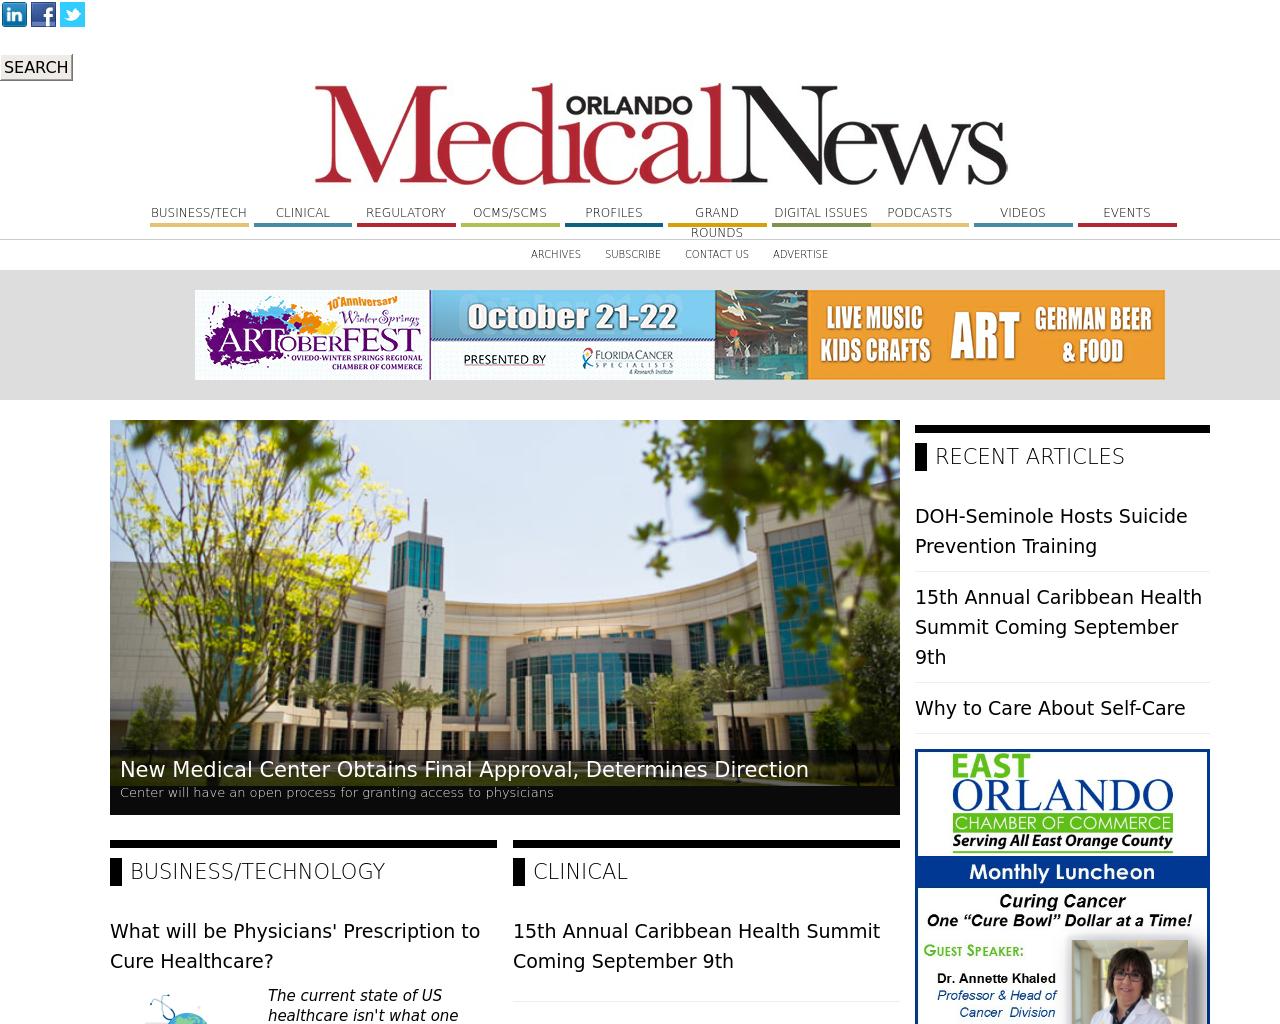 Orlando-Medical-News-Advertising-Reviews-Pricing